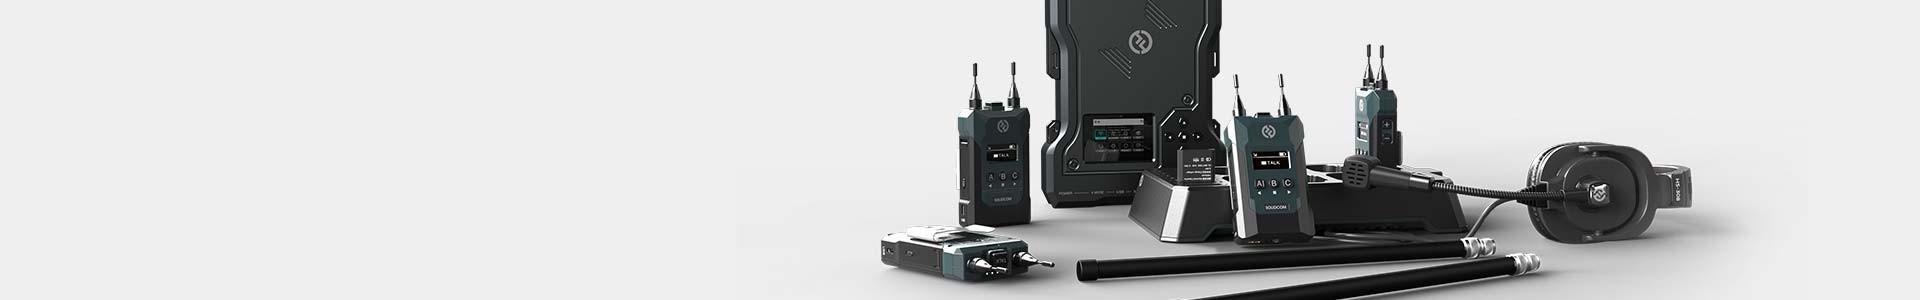 Hollyland - Professional Wireless Intercom Systems - Avacab